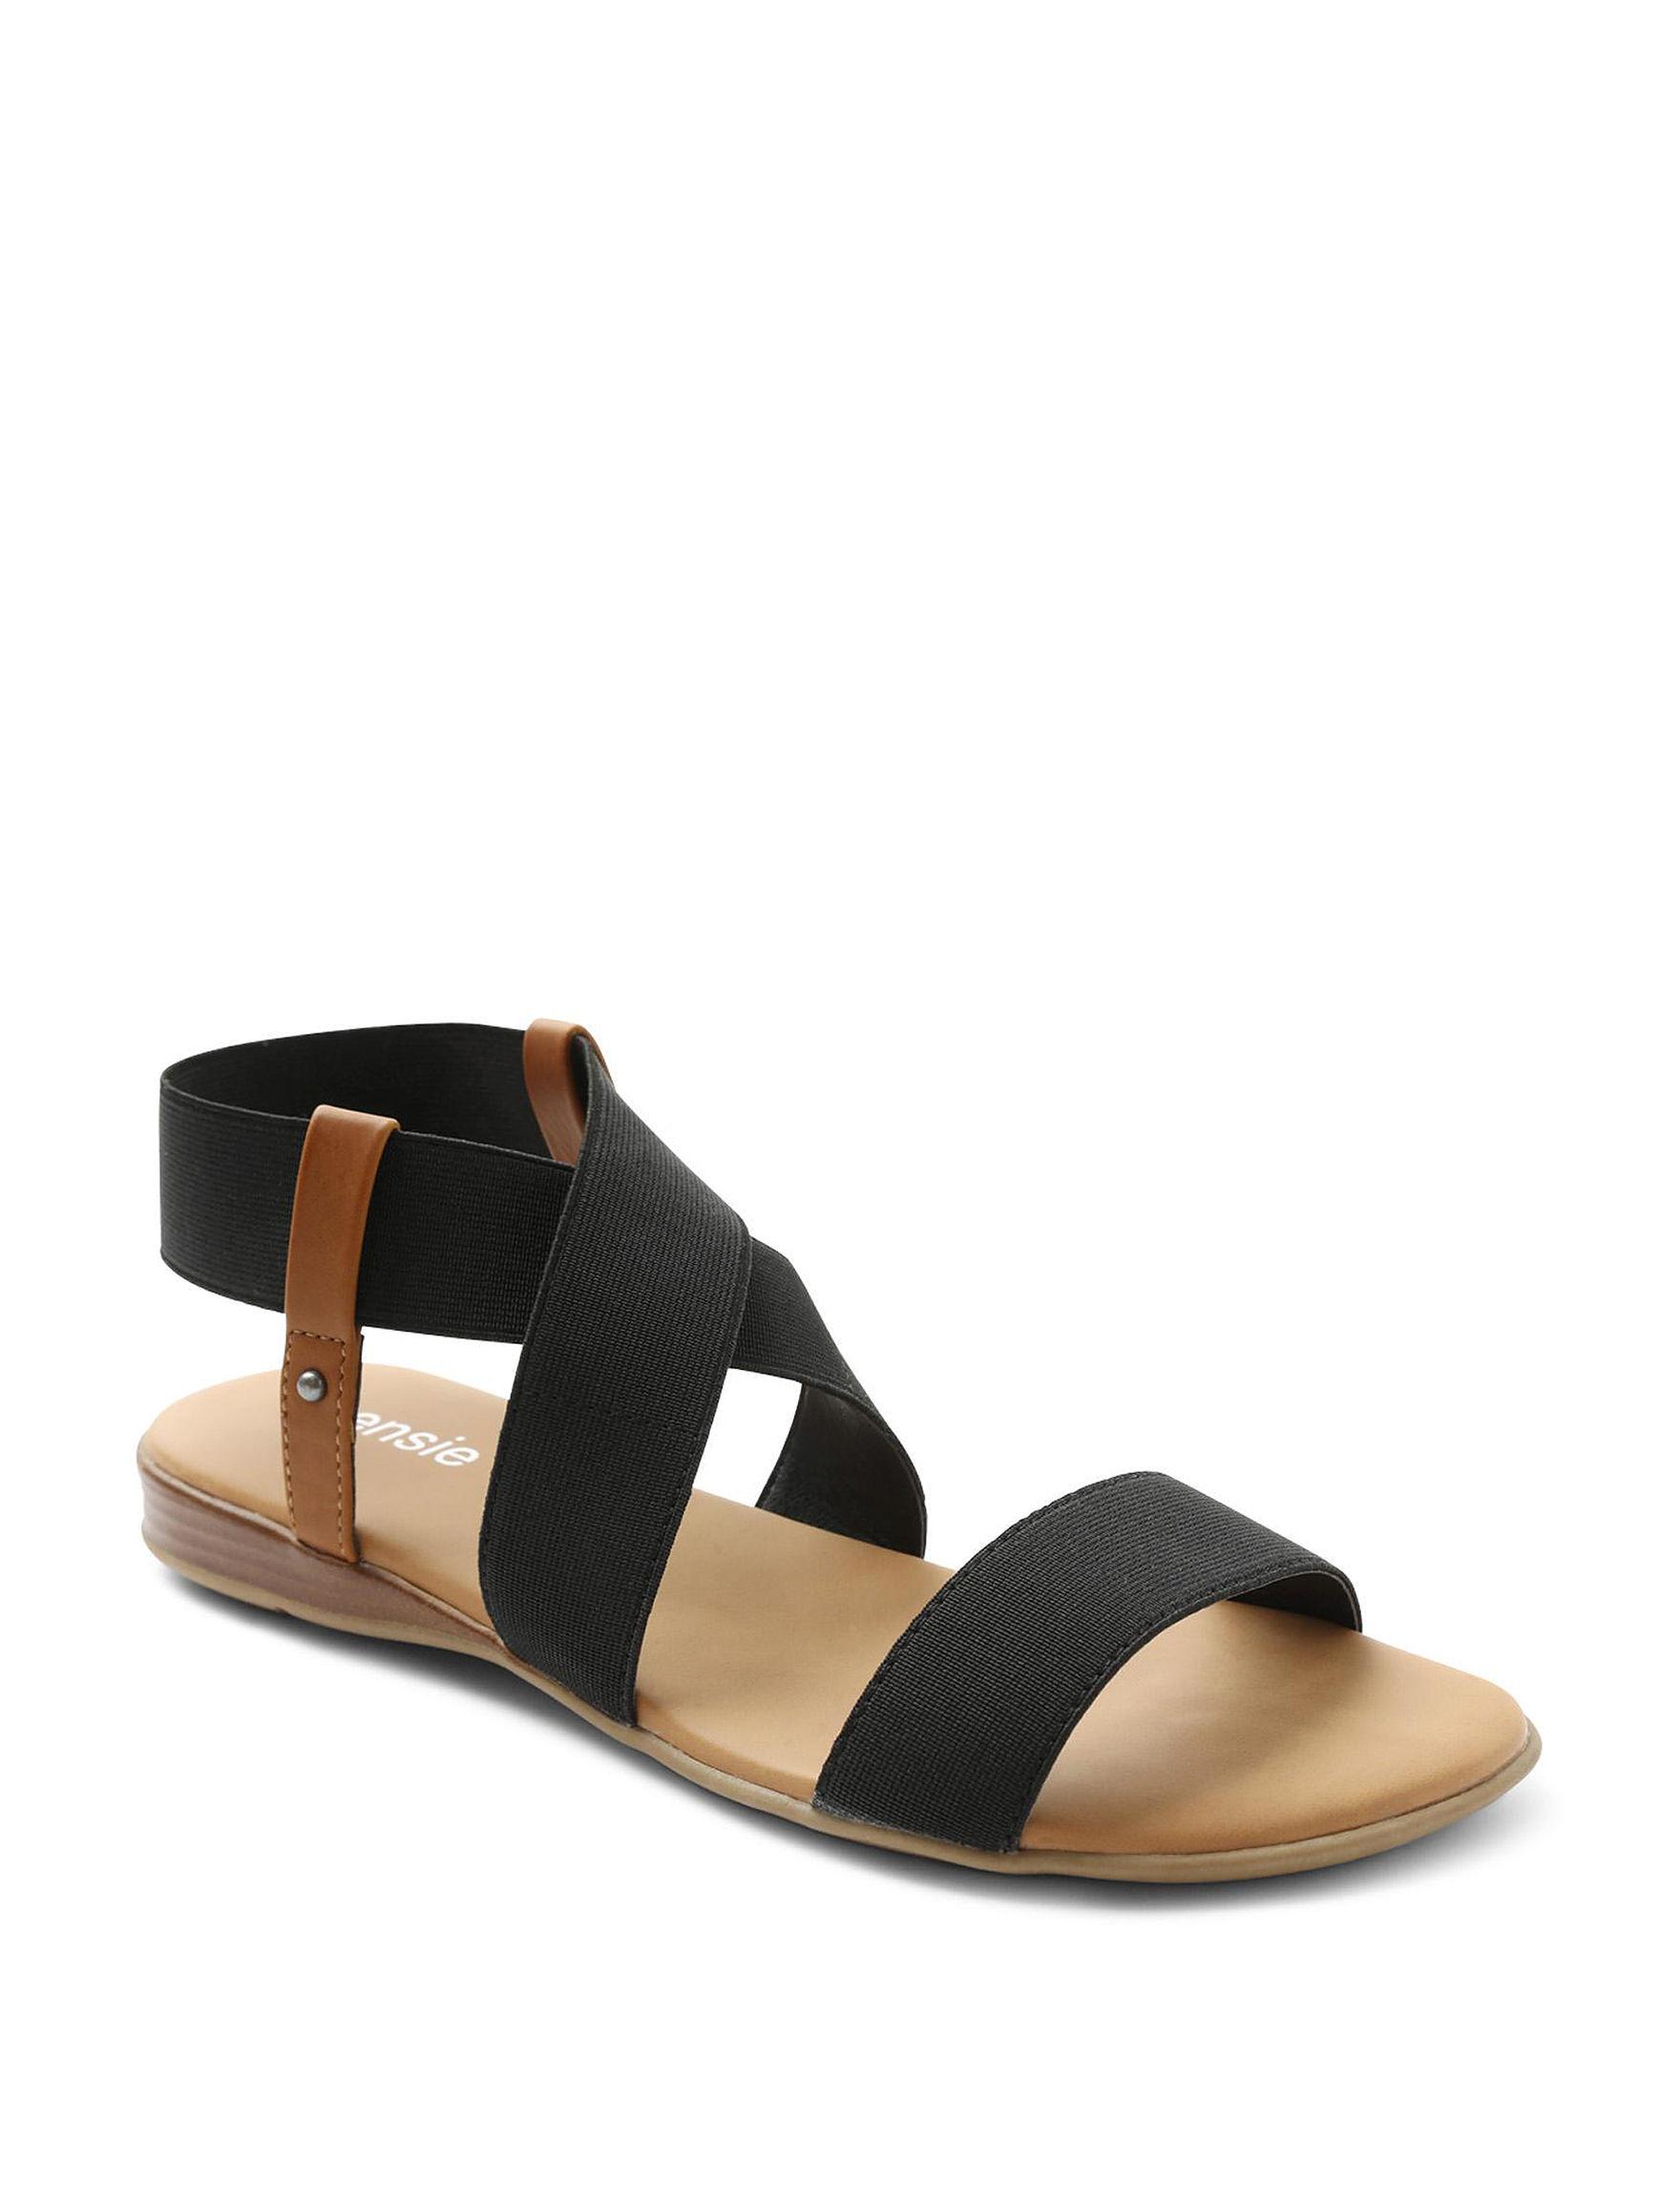 XOXO Black Flat Sandals